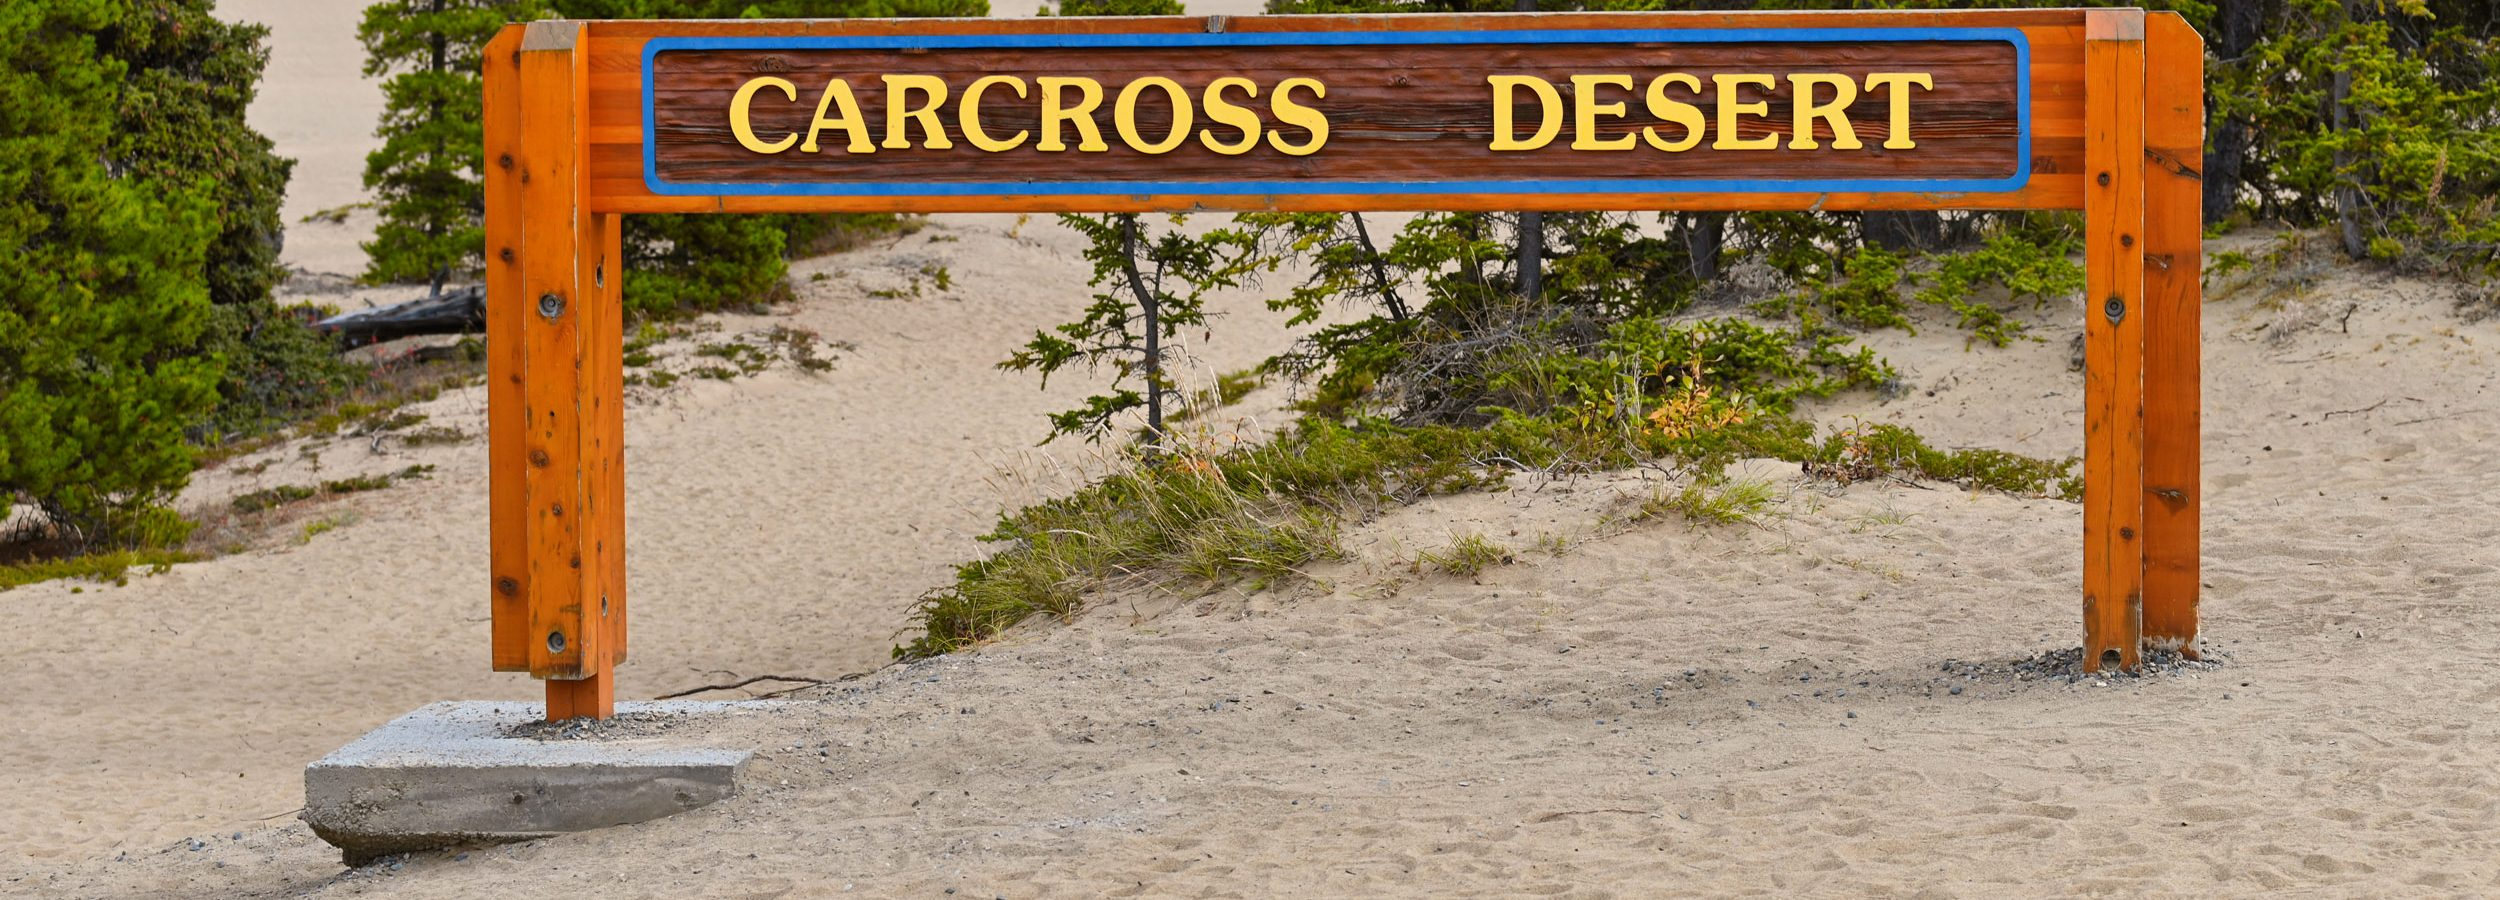 Carcross Desert, Yukon, Canada